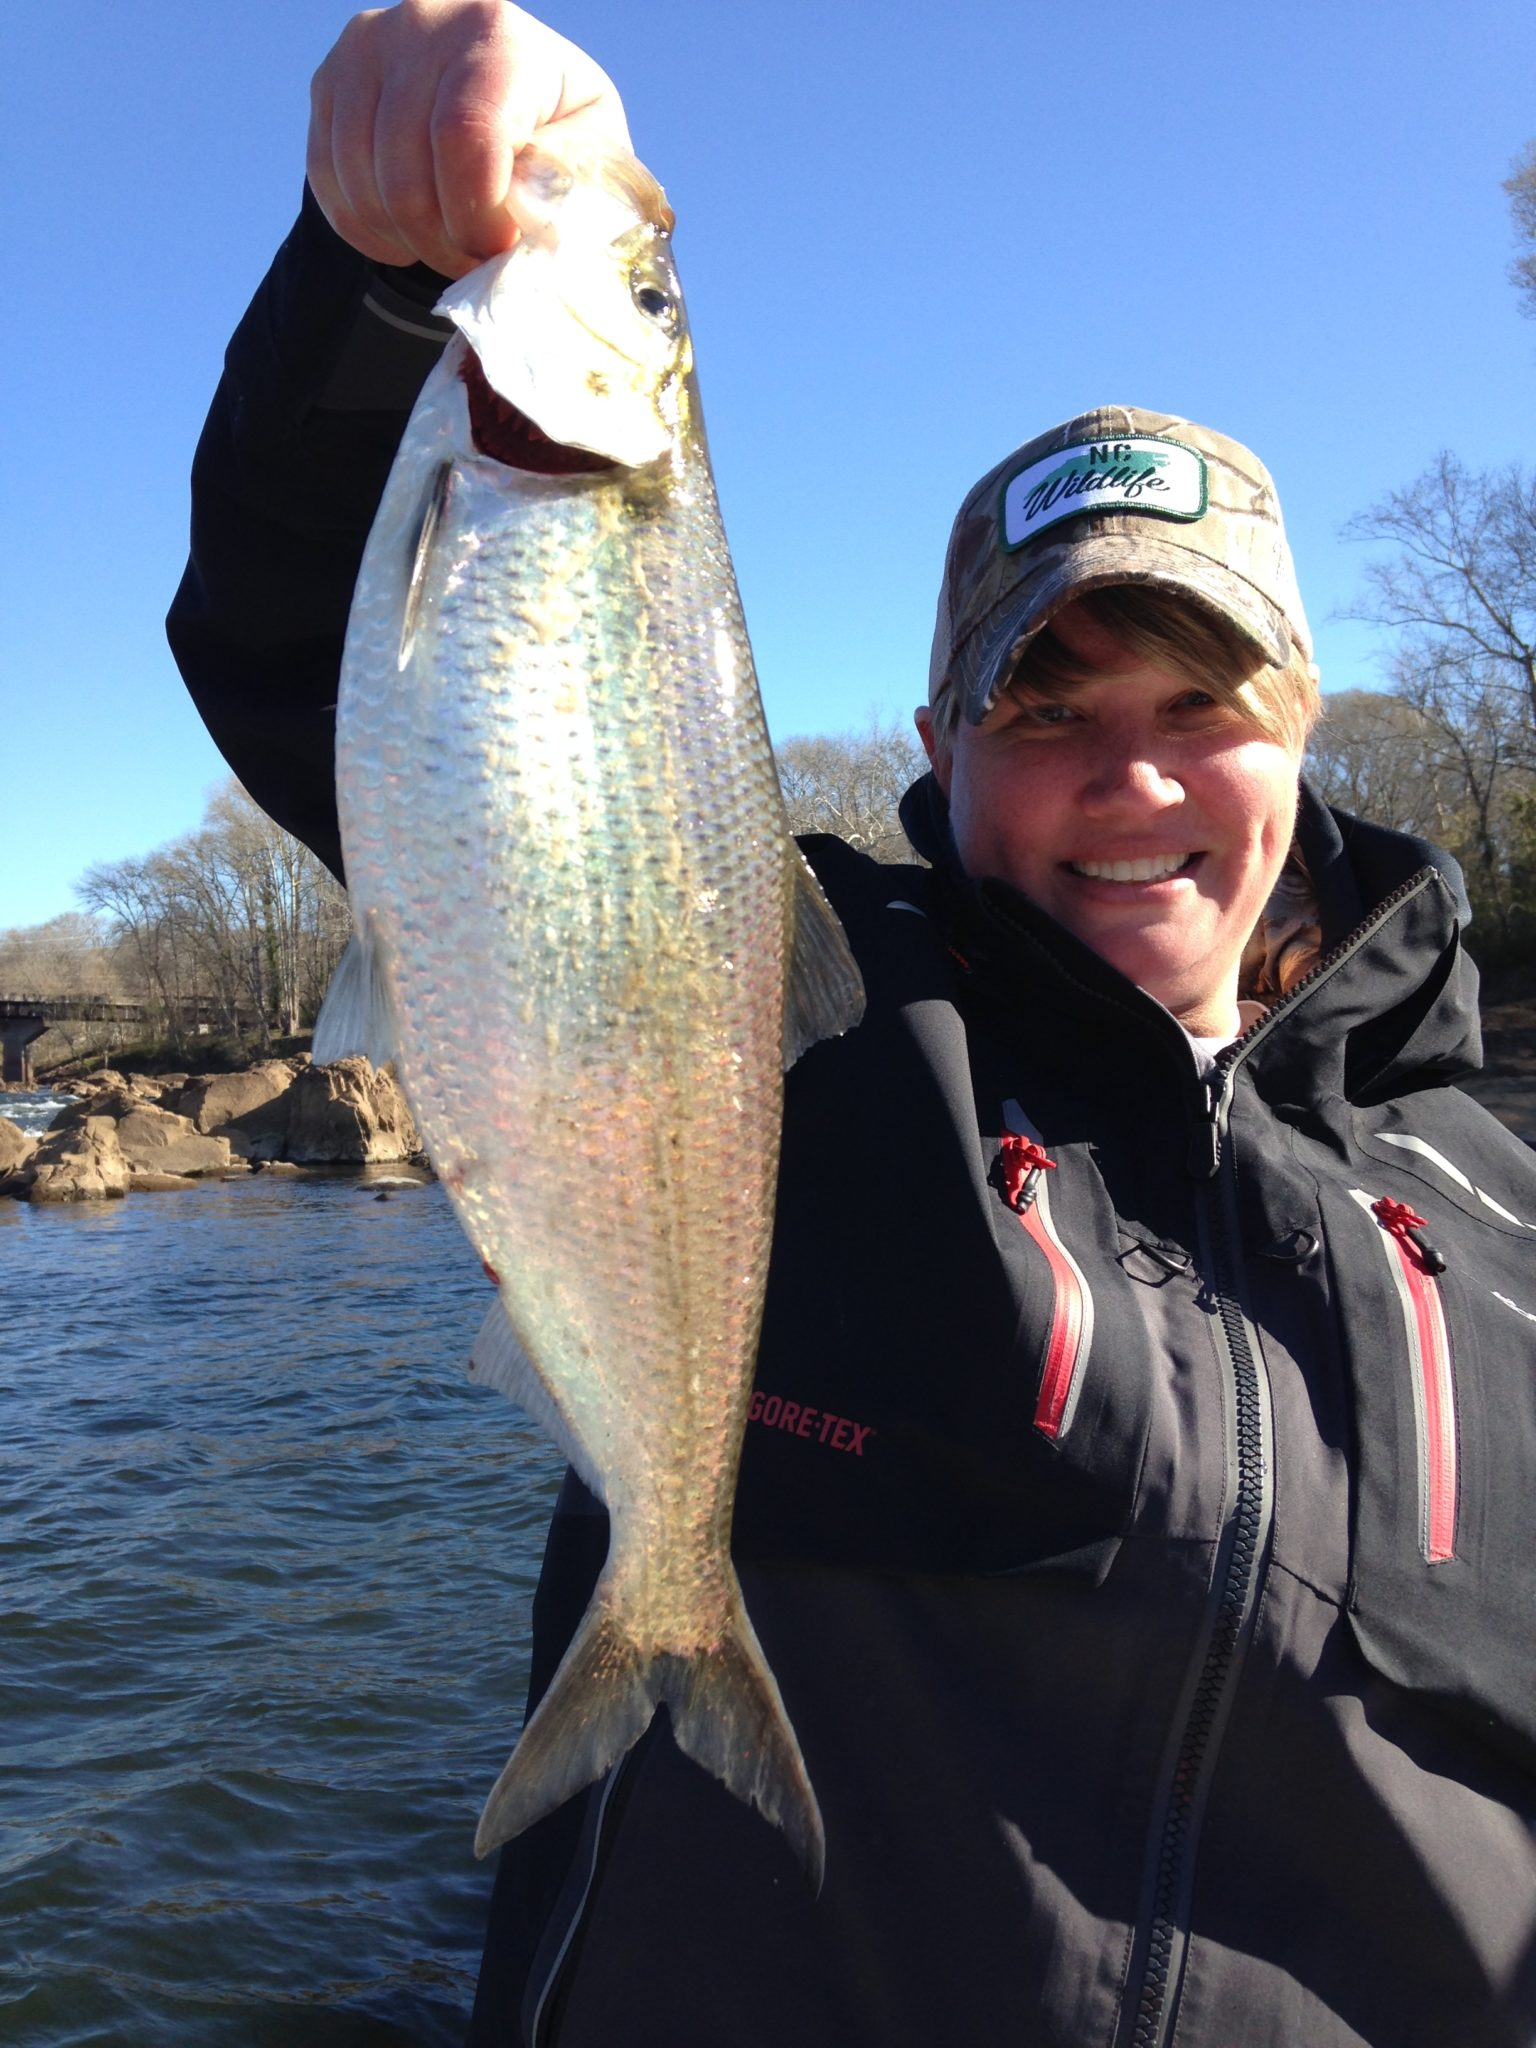 Roanoke river shad fishing fishibx eastern nc fishing guide for Northeast saltwater fishing reports